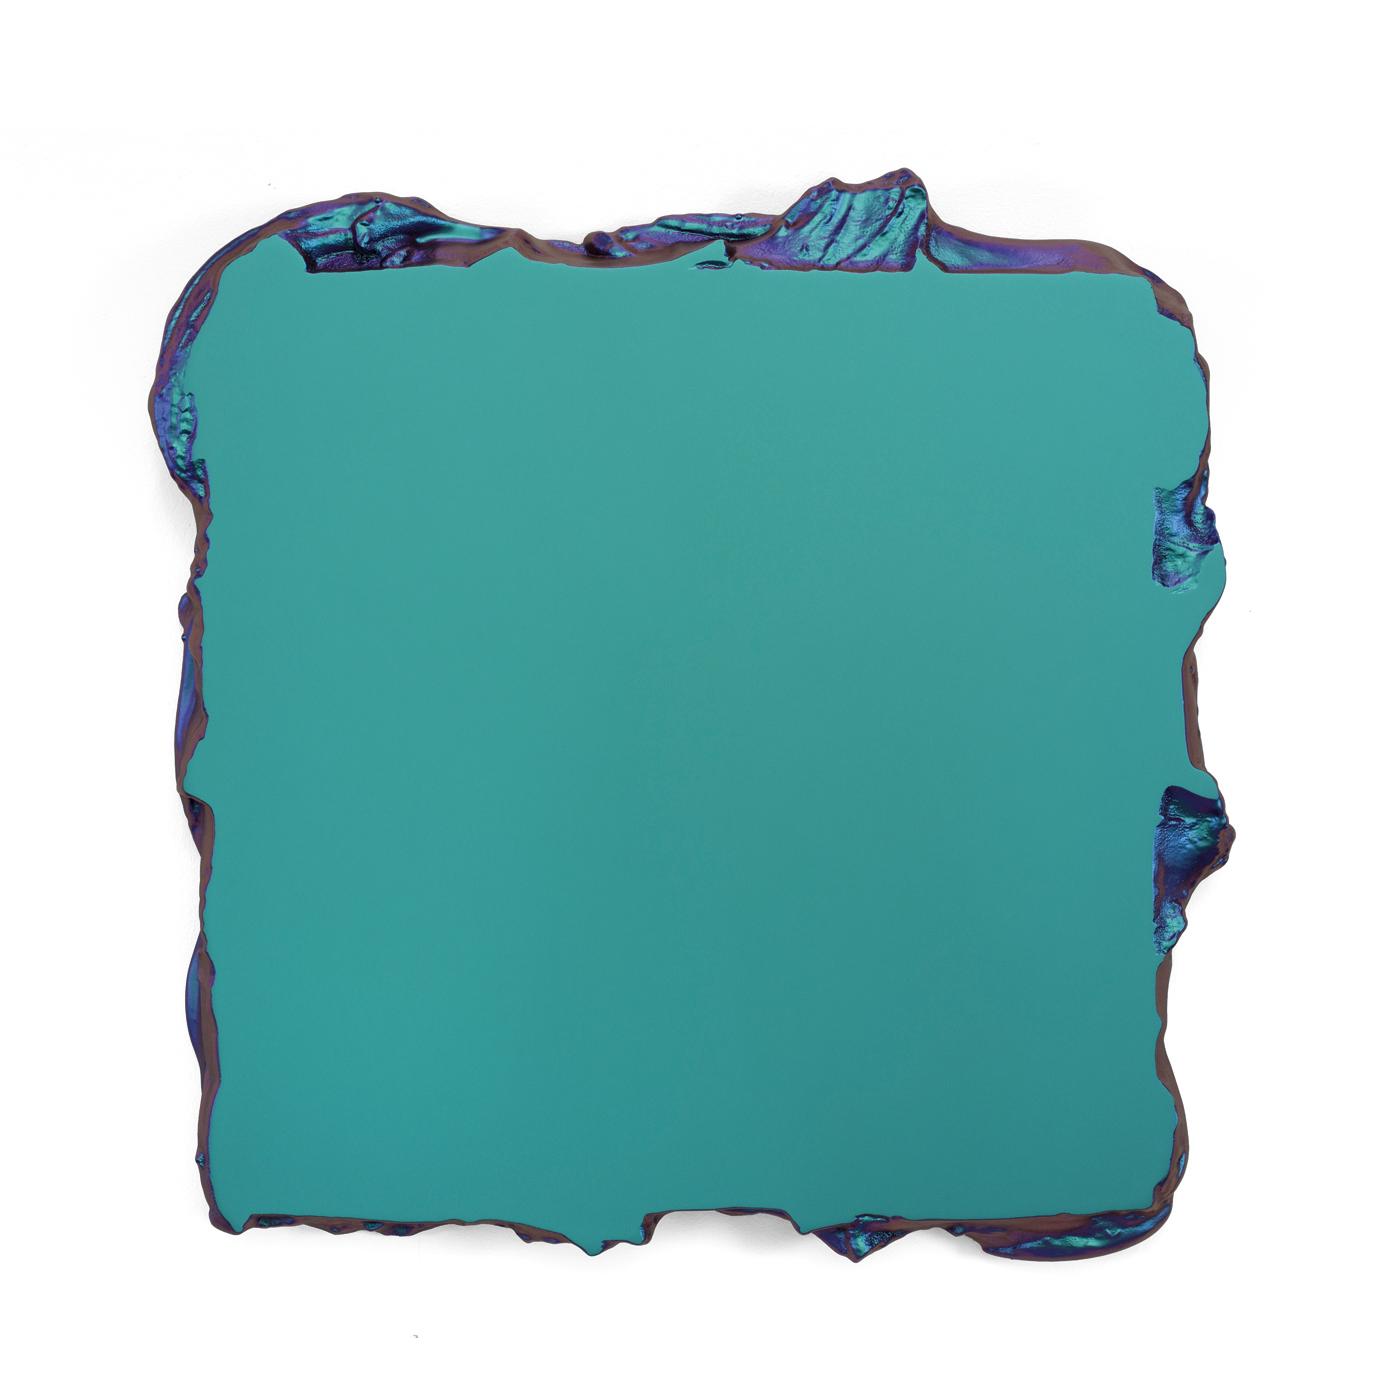 Juri Markkula Green to Lilac 50x50cm Interference pigment, polyurethan